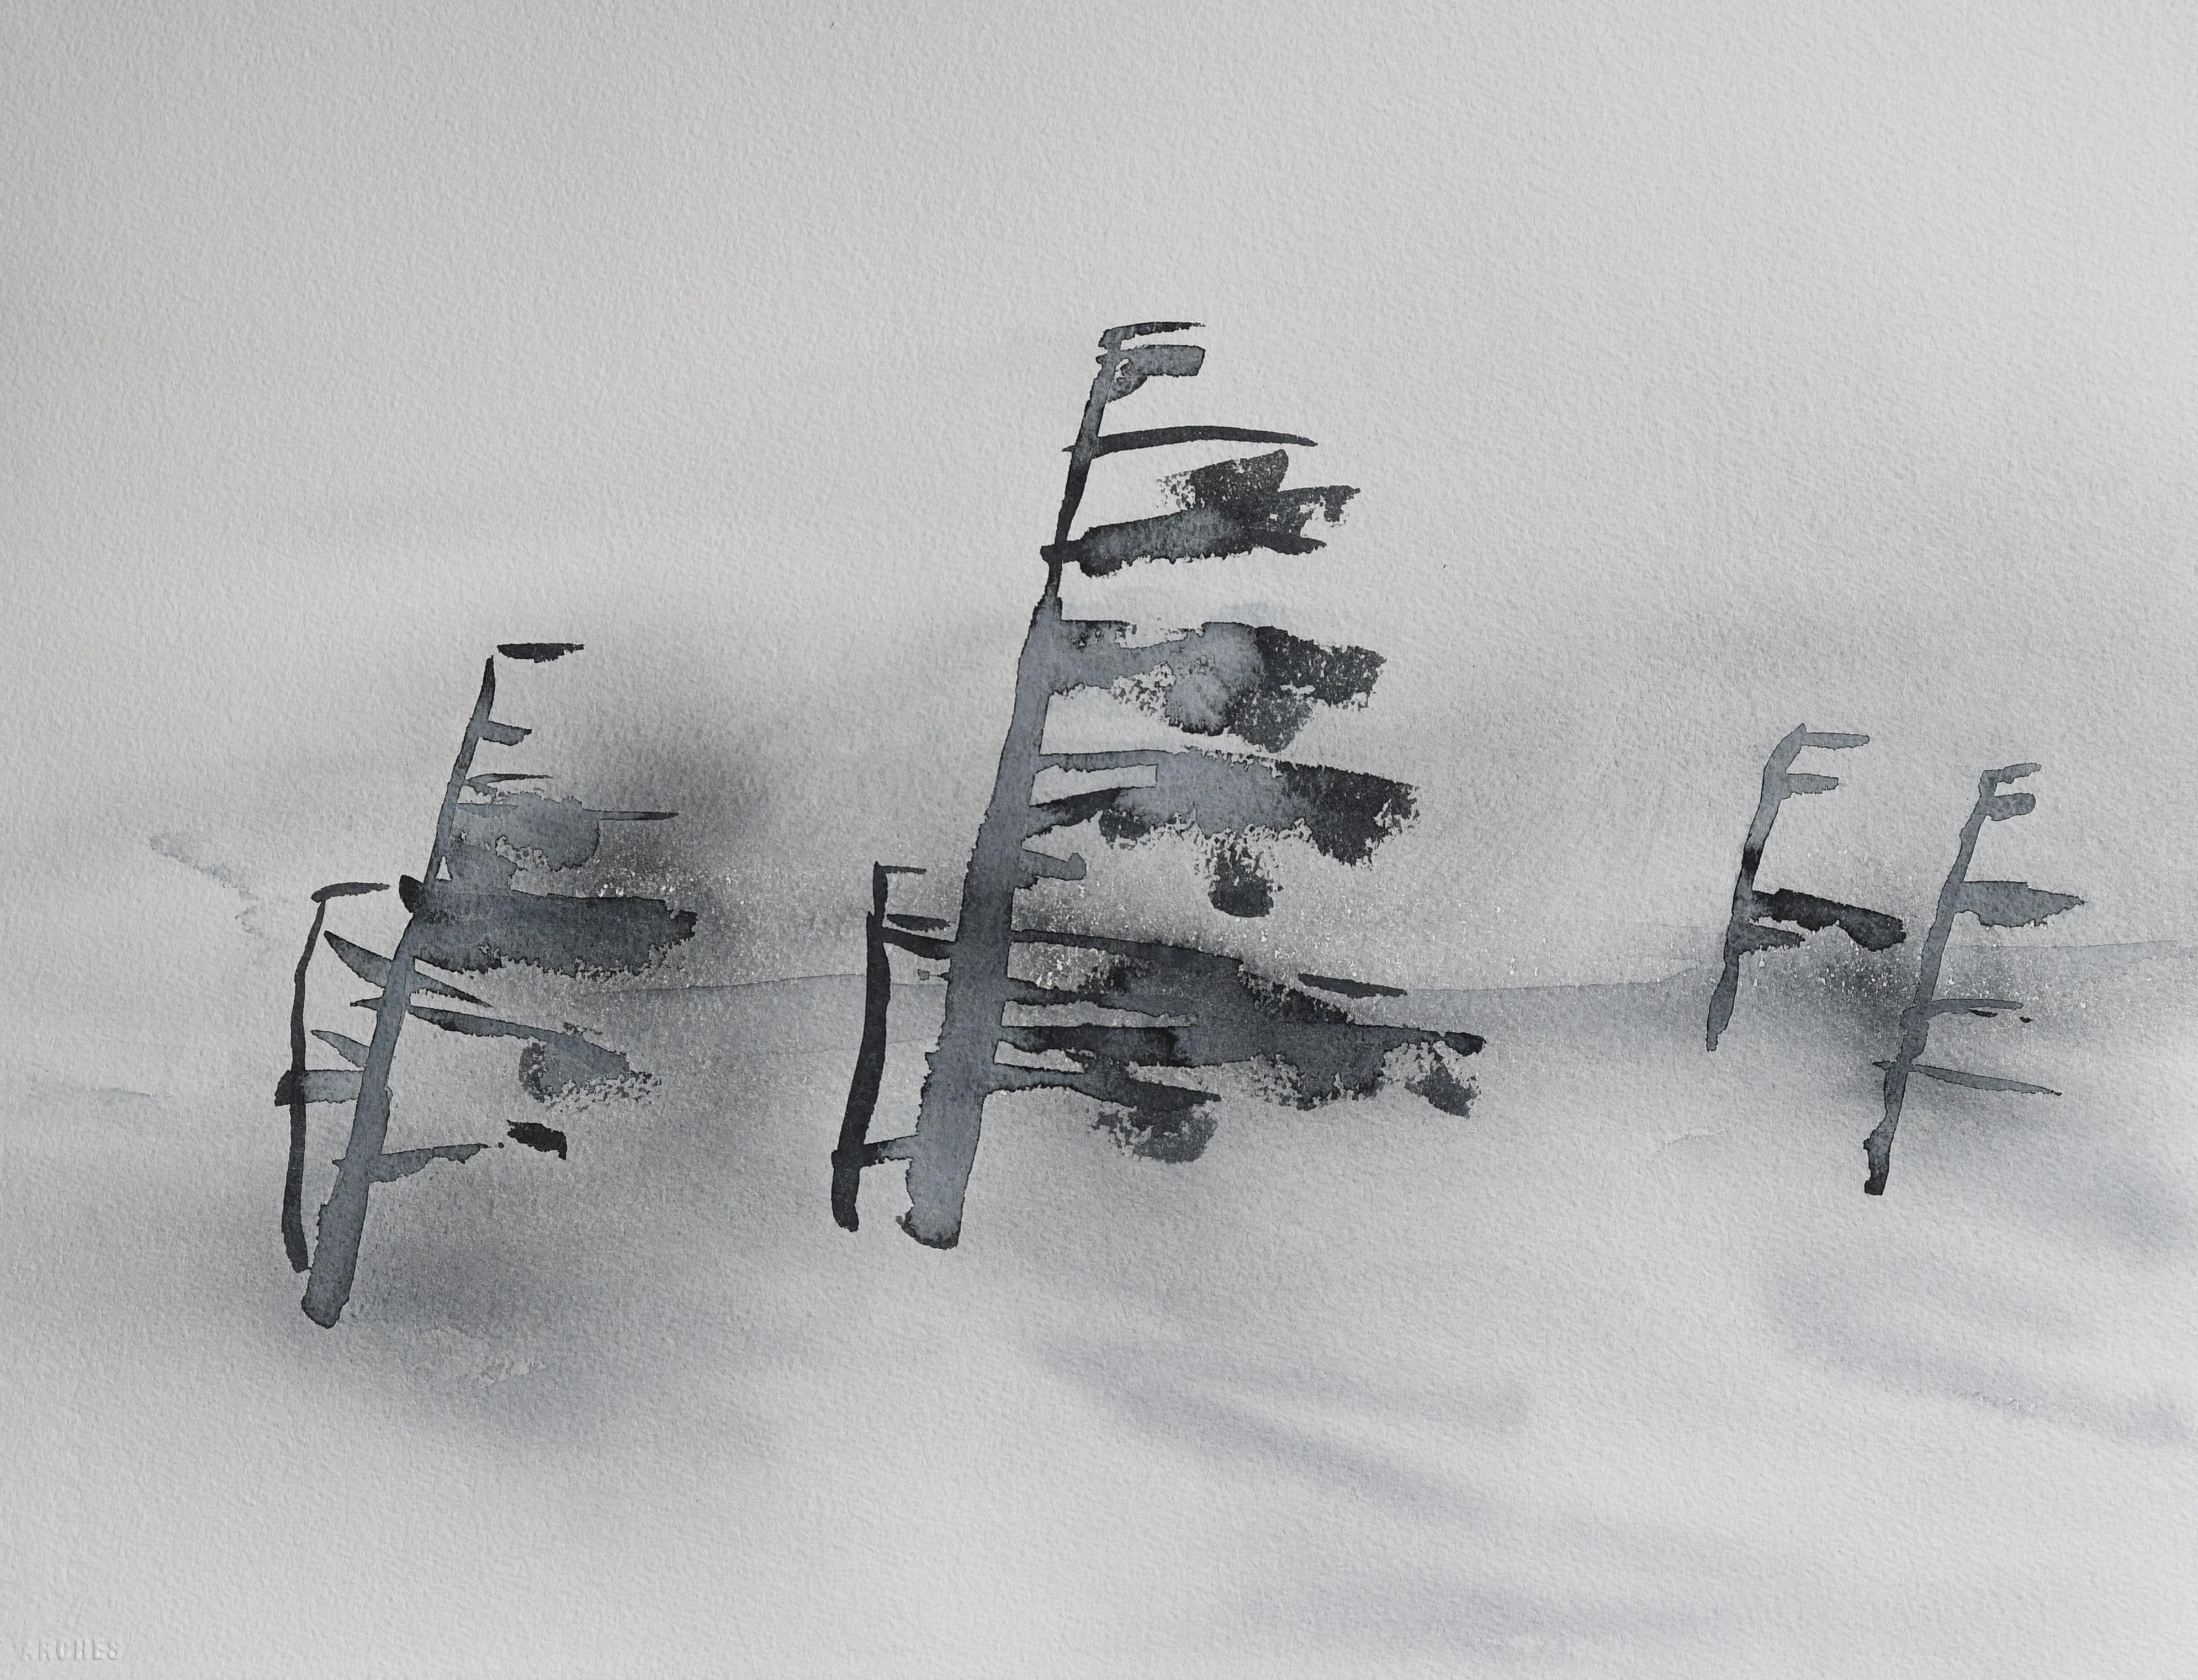 Furu i vind (38 x 53 cm)